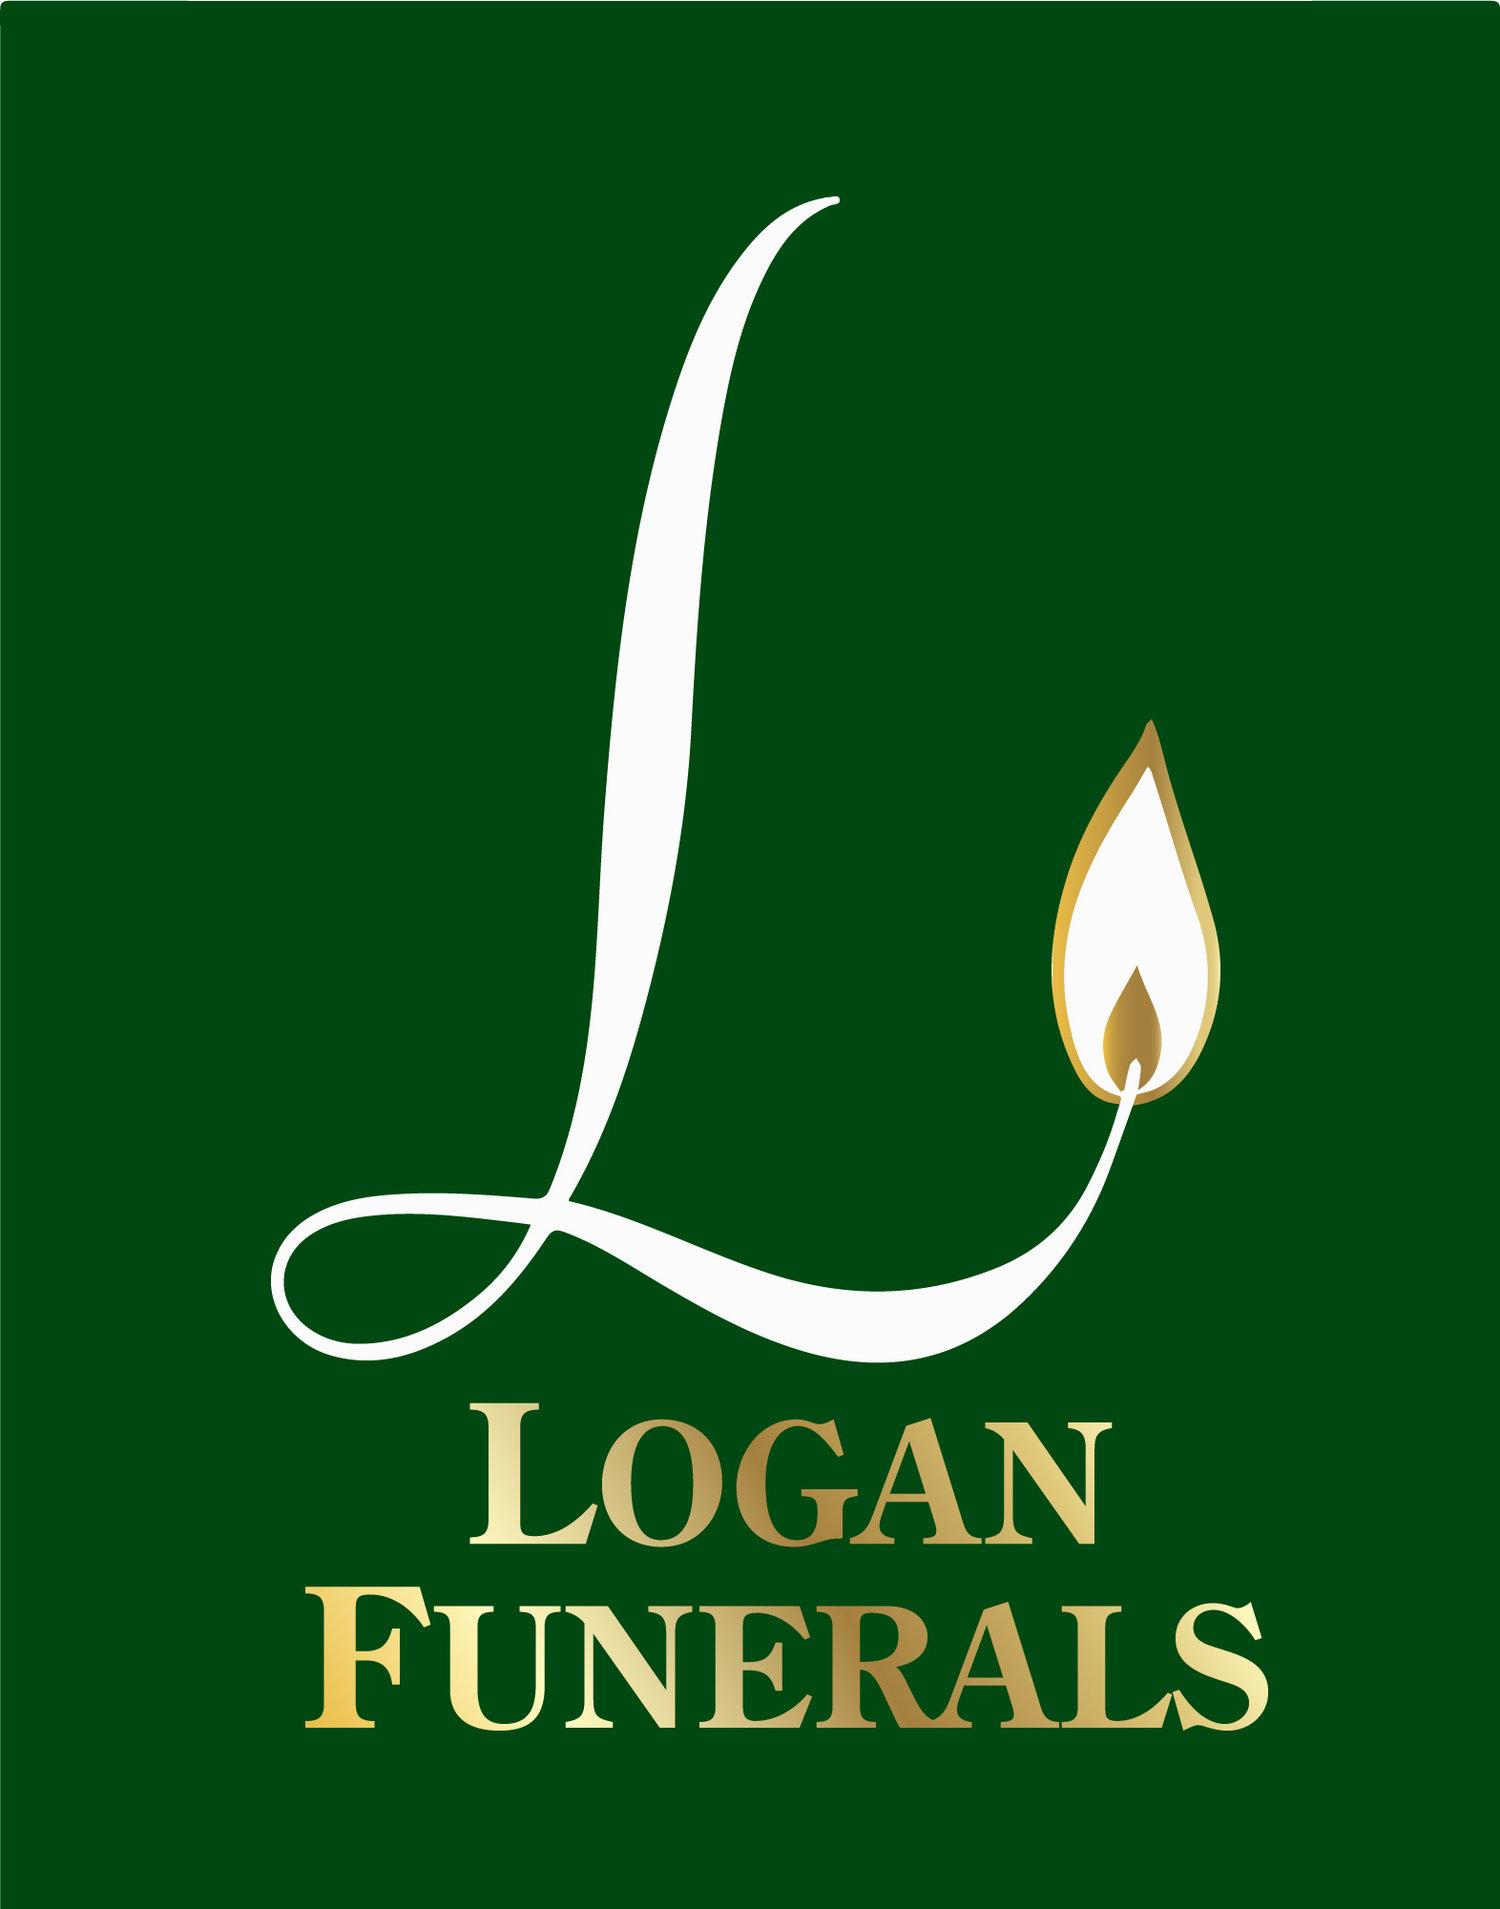 Logan's funerals.jpeg